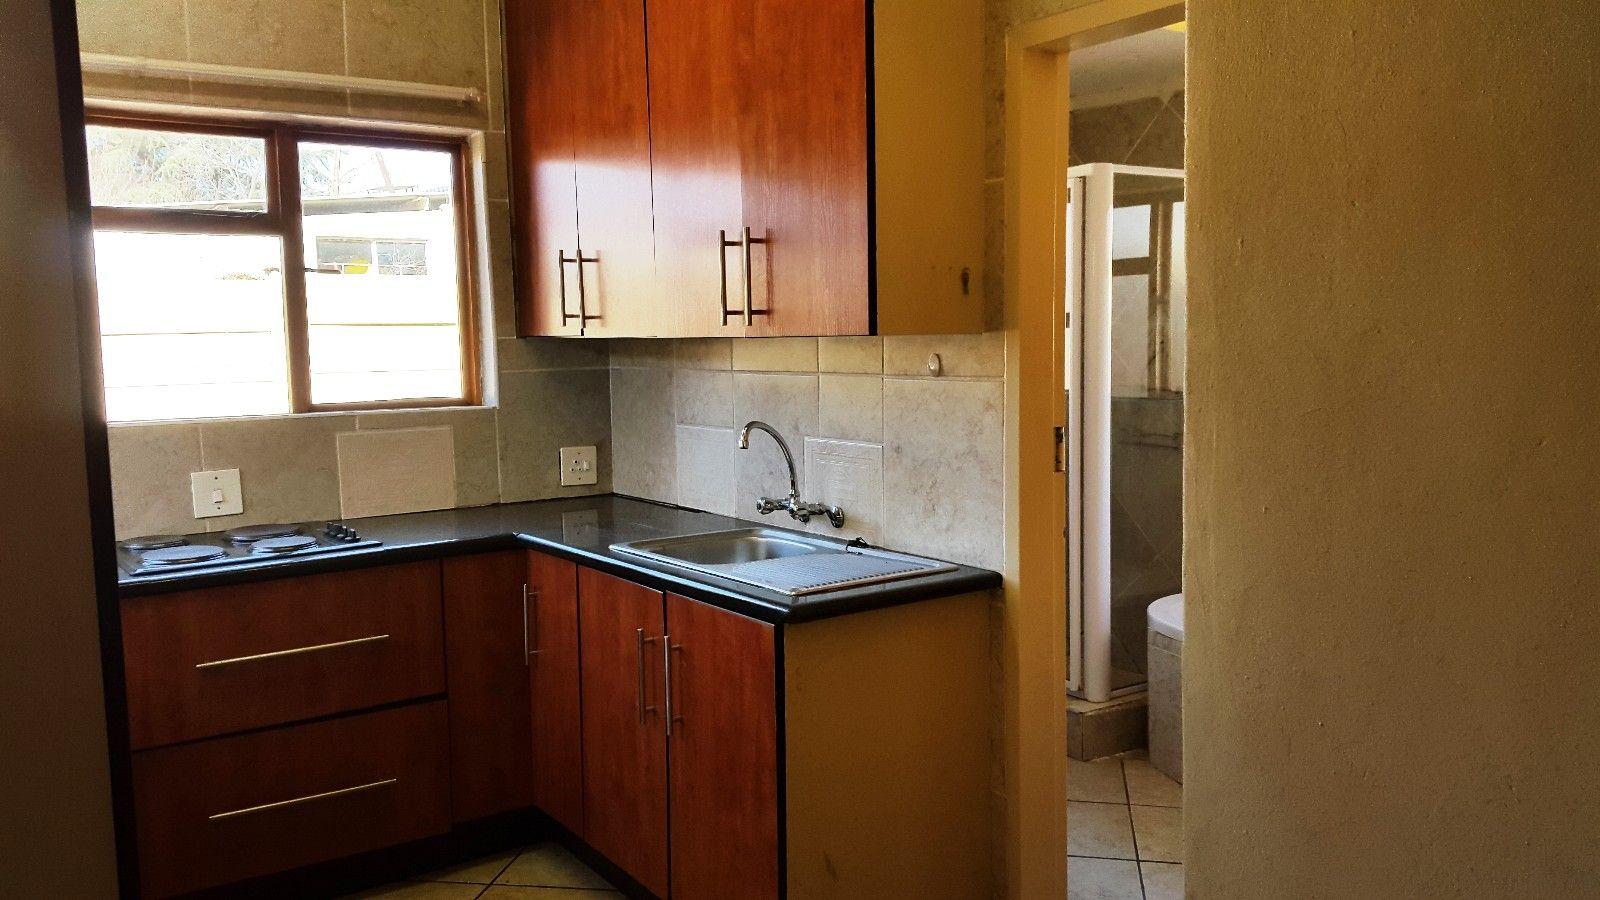 Baillie Park property for sale. Ref No: 13377937. Picture no 20